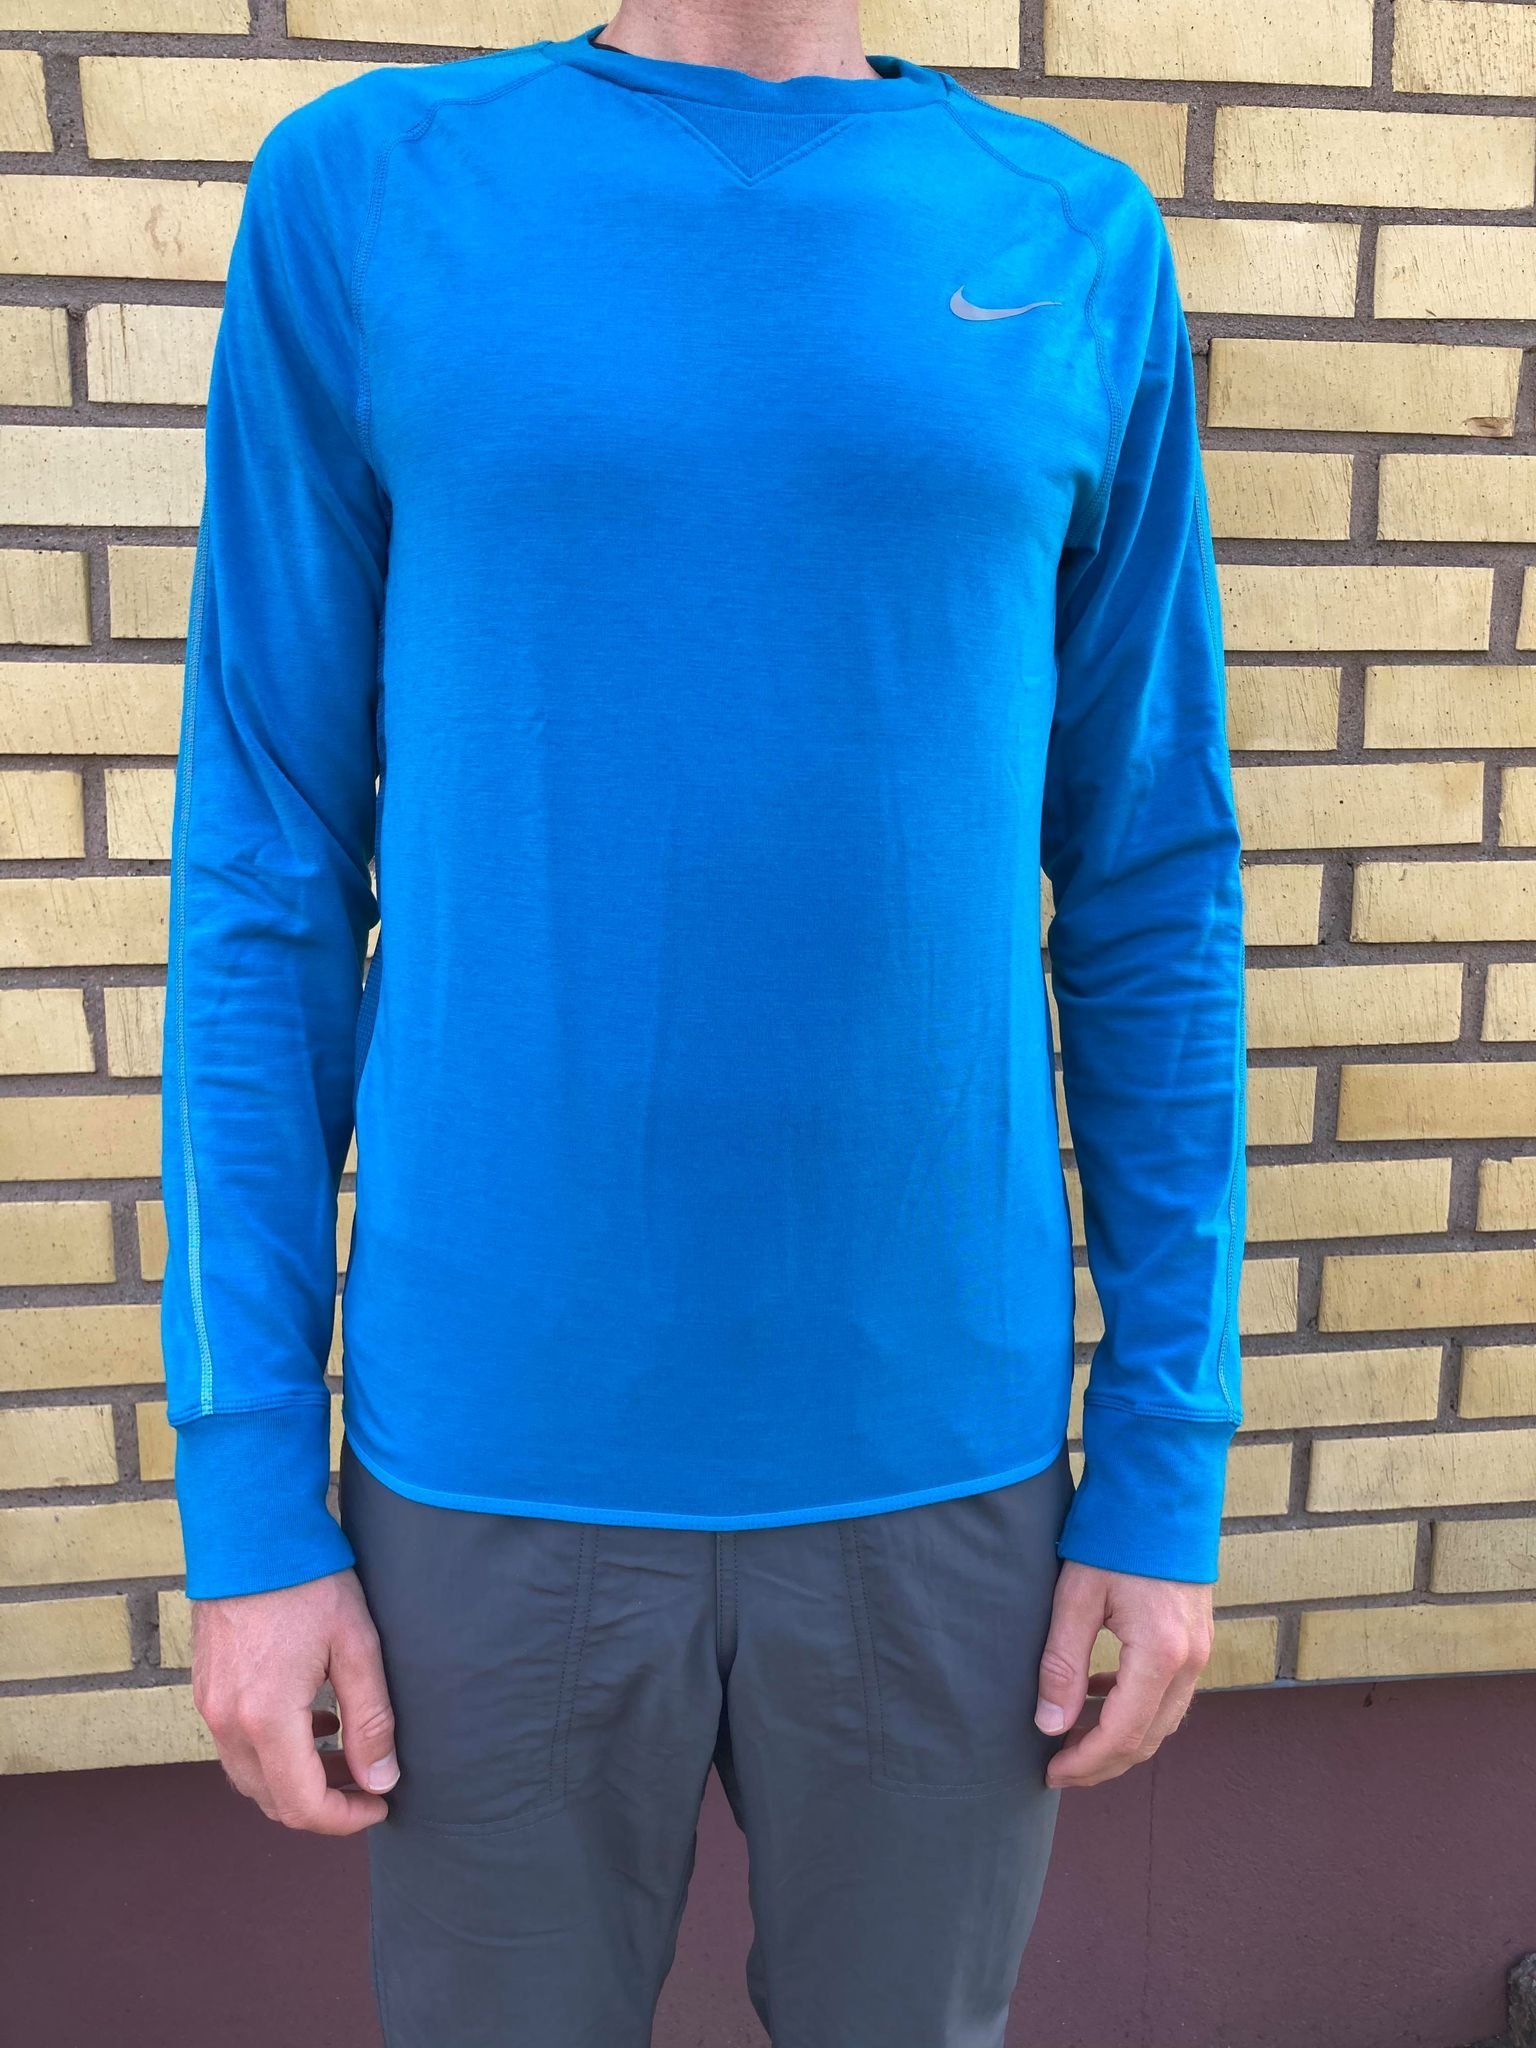 Nike Running DRI FIT tröja blå storlek S